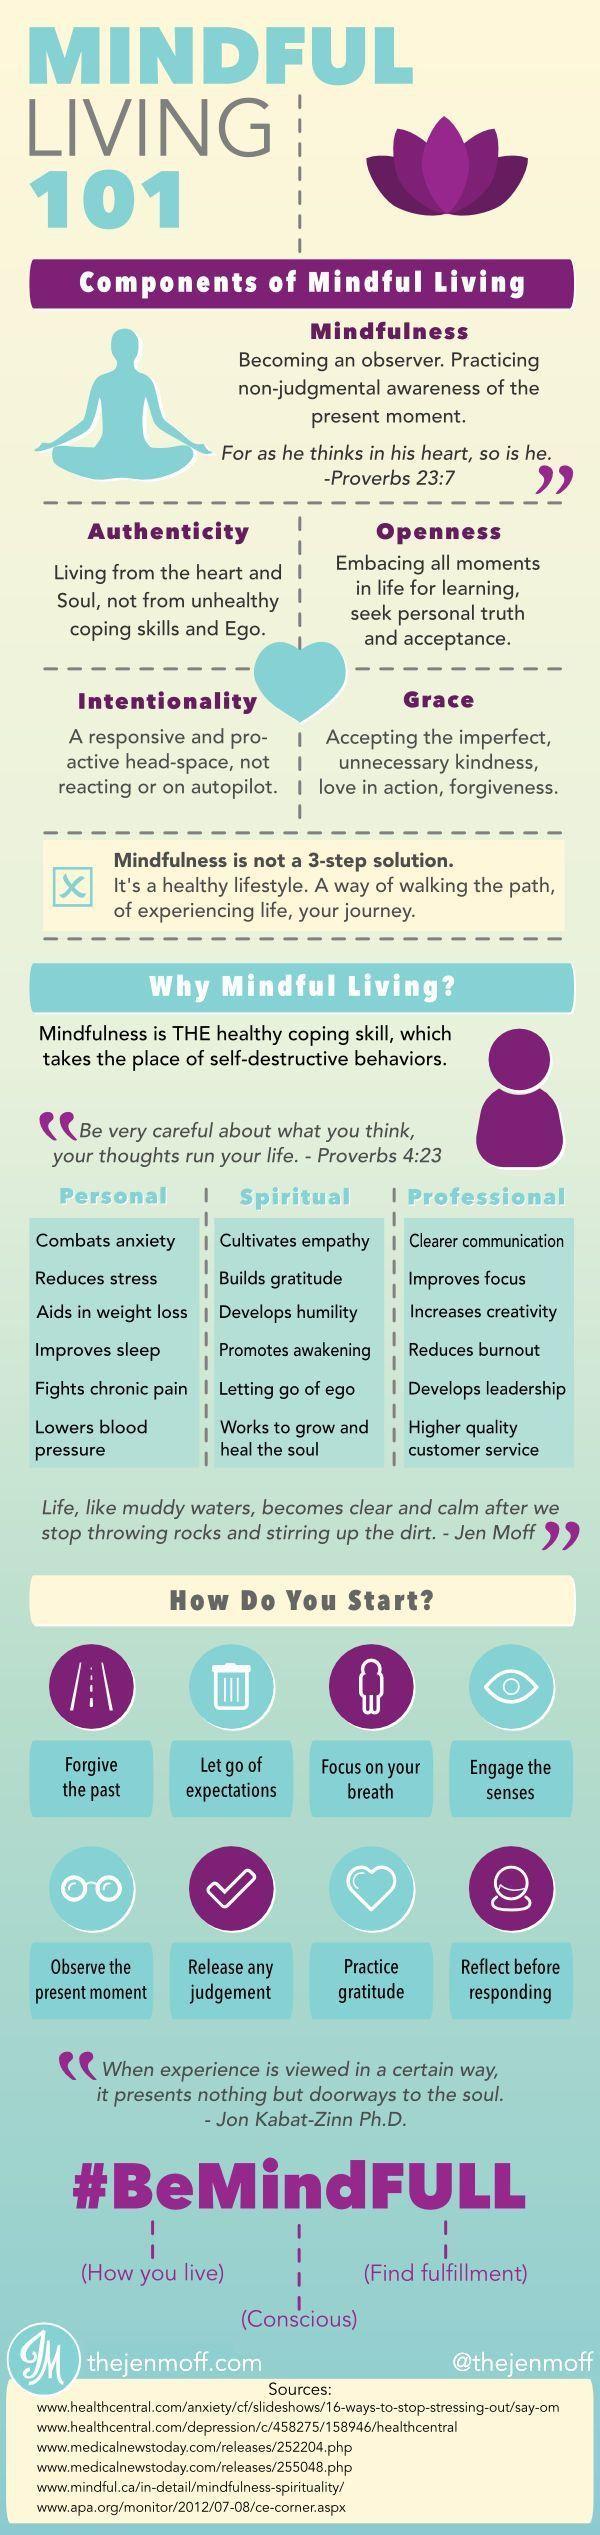 Mindful Living 101